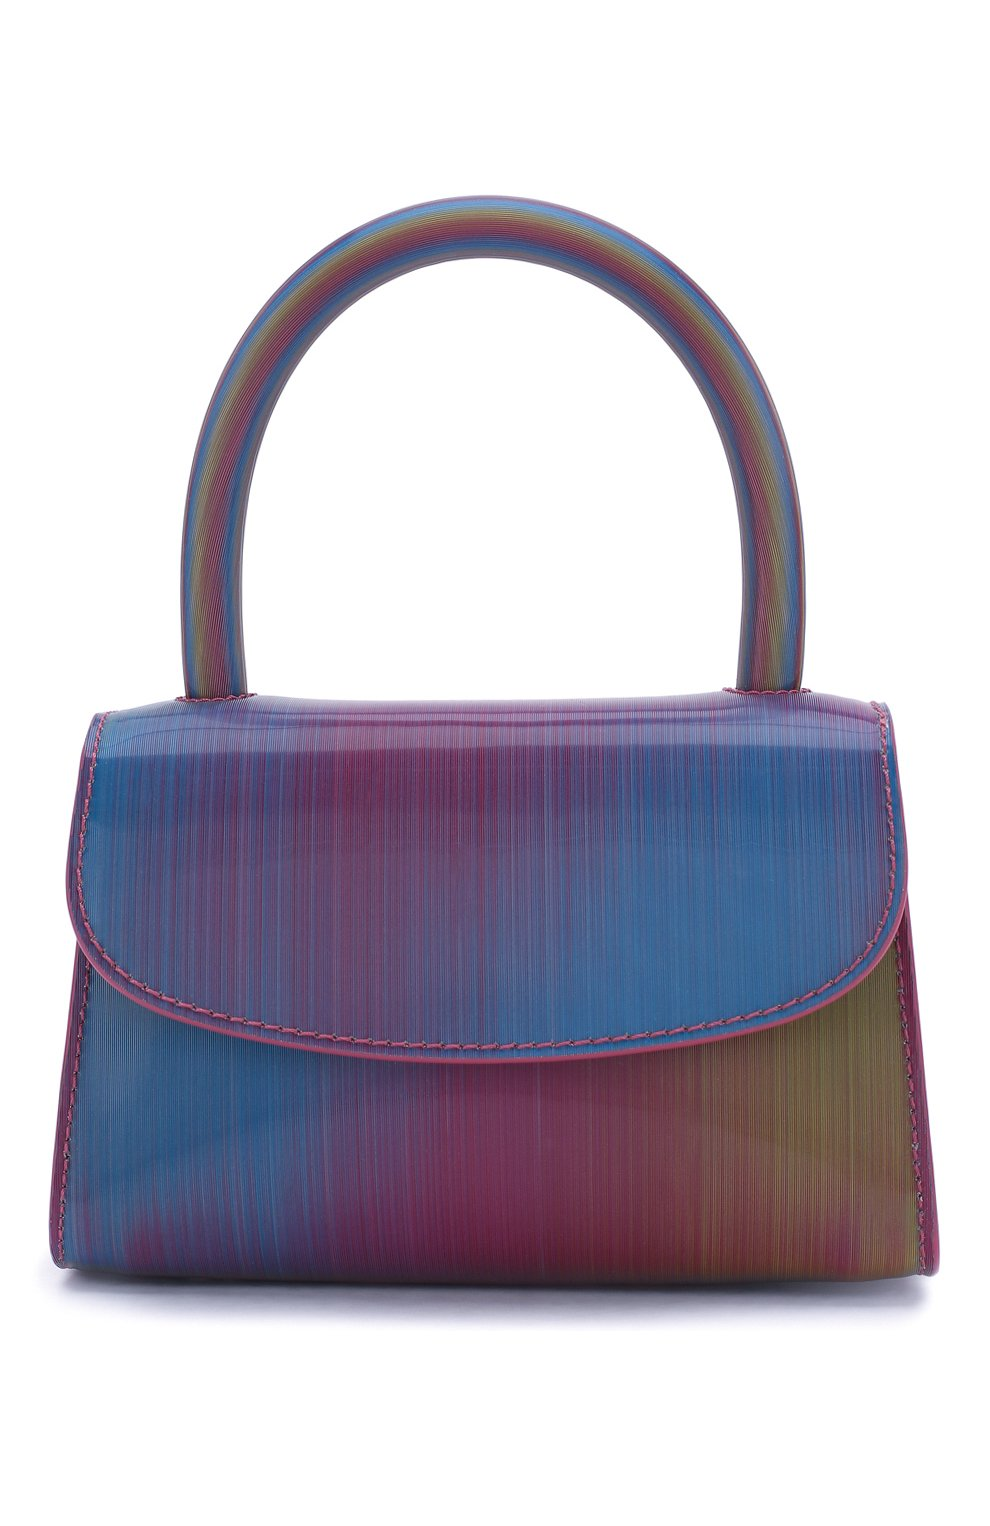 Женская сумка mini BY FAR разноцветного цвета, арт. 20SSMINARNLSMA   Фото 1 (Сумки-технические: Сумки через плечо, Сумки top-handle; Материал: Натуральная кожа; Размер: mini; Ремень/цепочка: На ремешке)